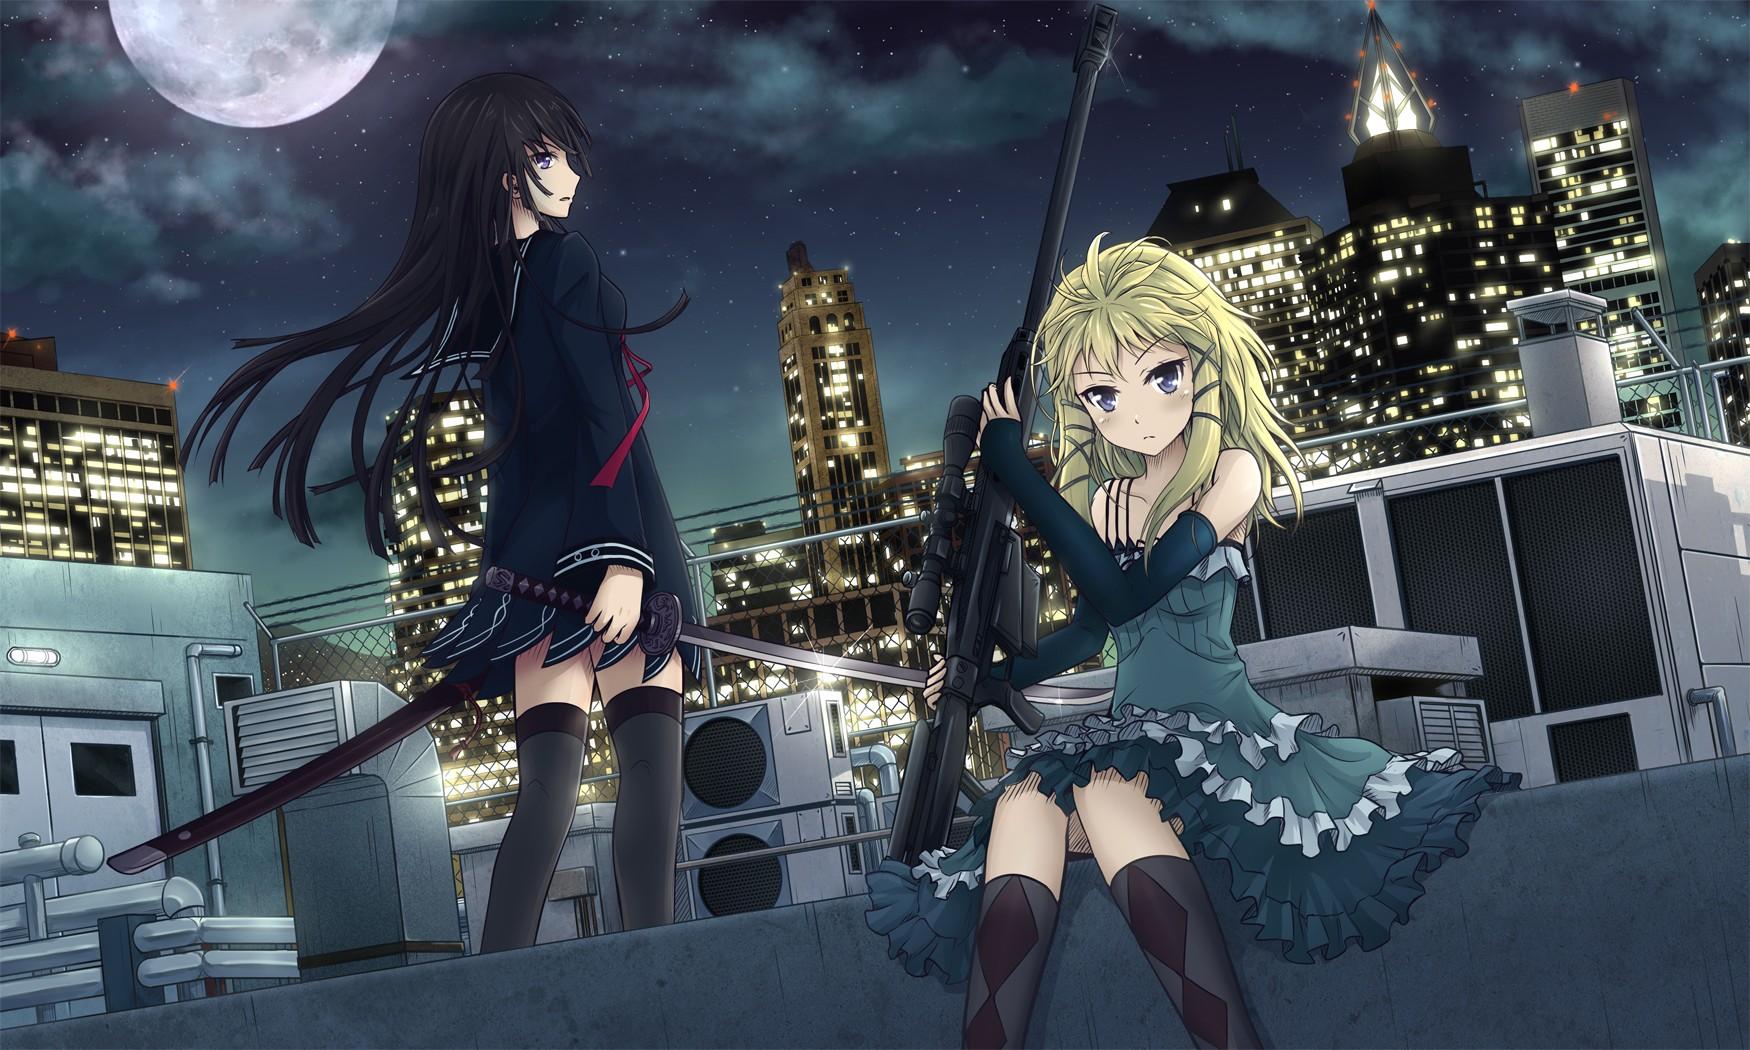 anime girls, machine gun, black bullet, tina sprout, anime, kisara